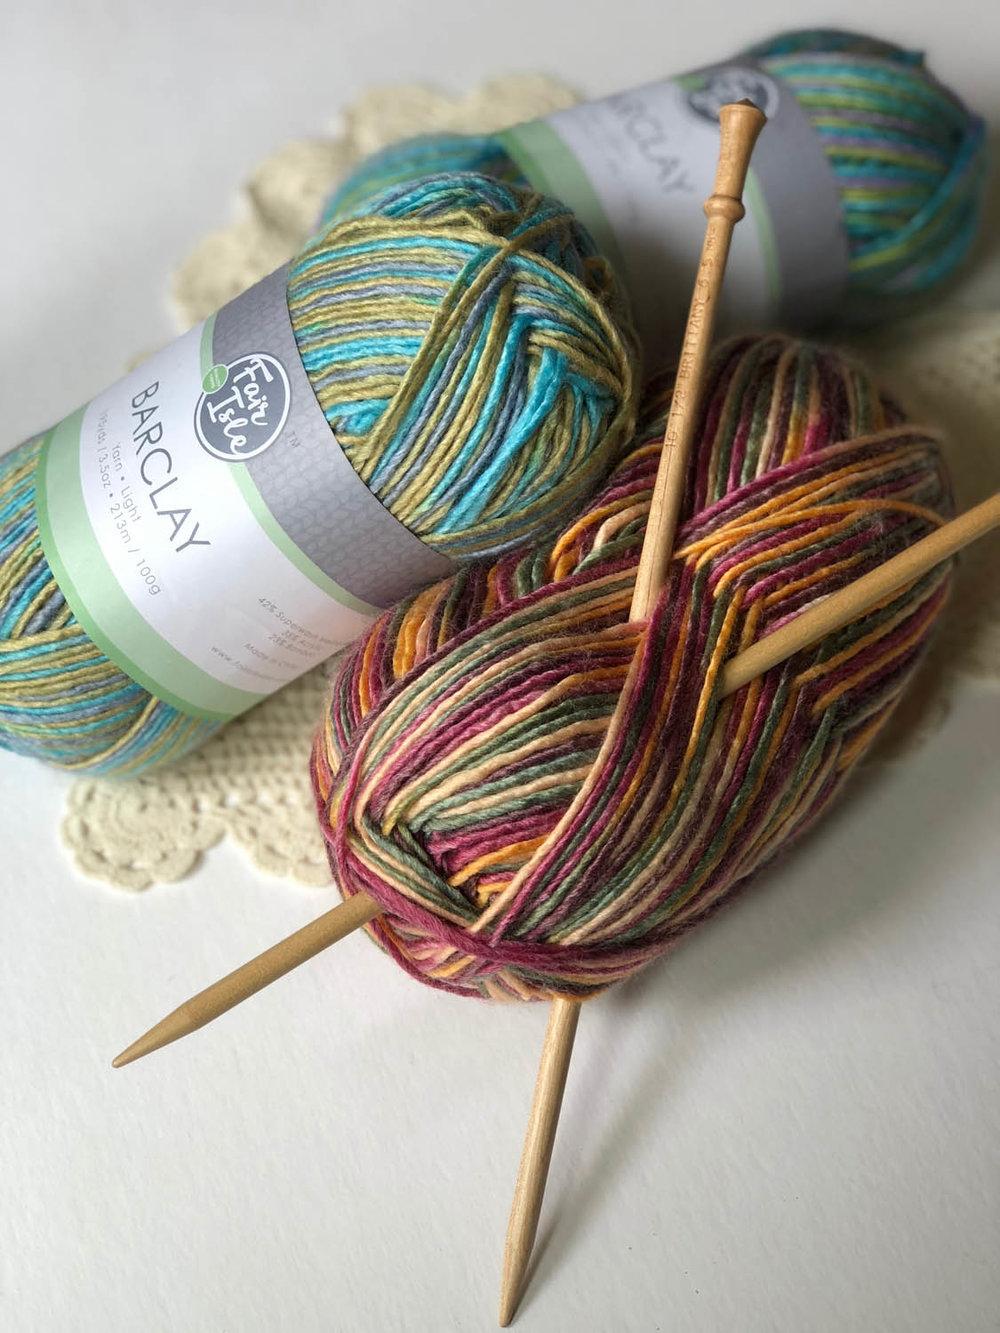 Barclay variegated superwash yarn from Fair Isle